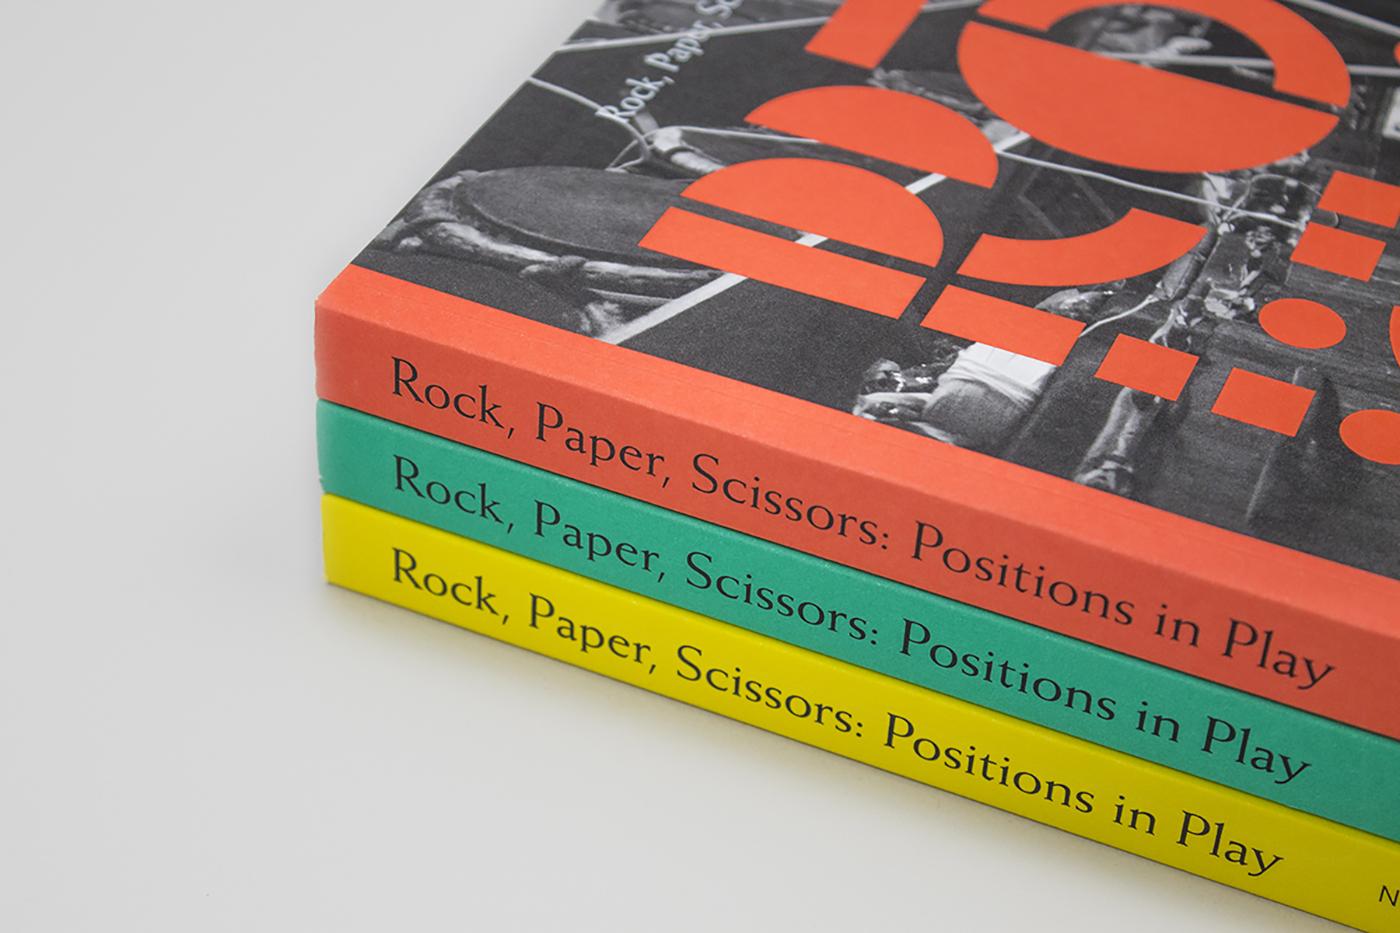 rock-paper-scissors-positions-in-play-03